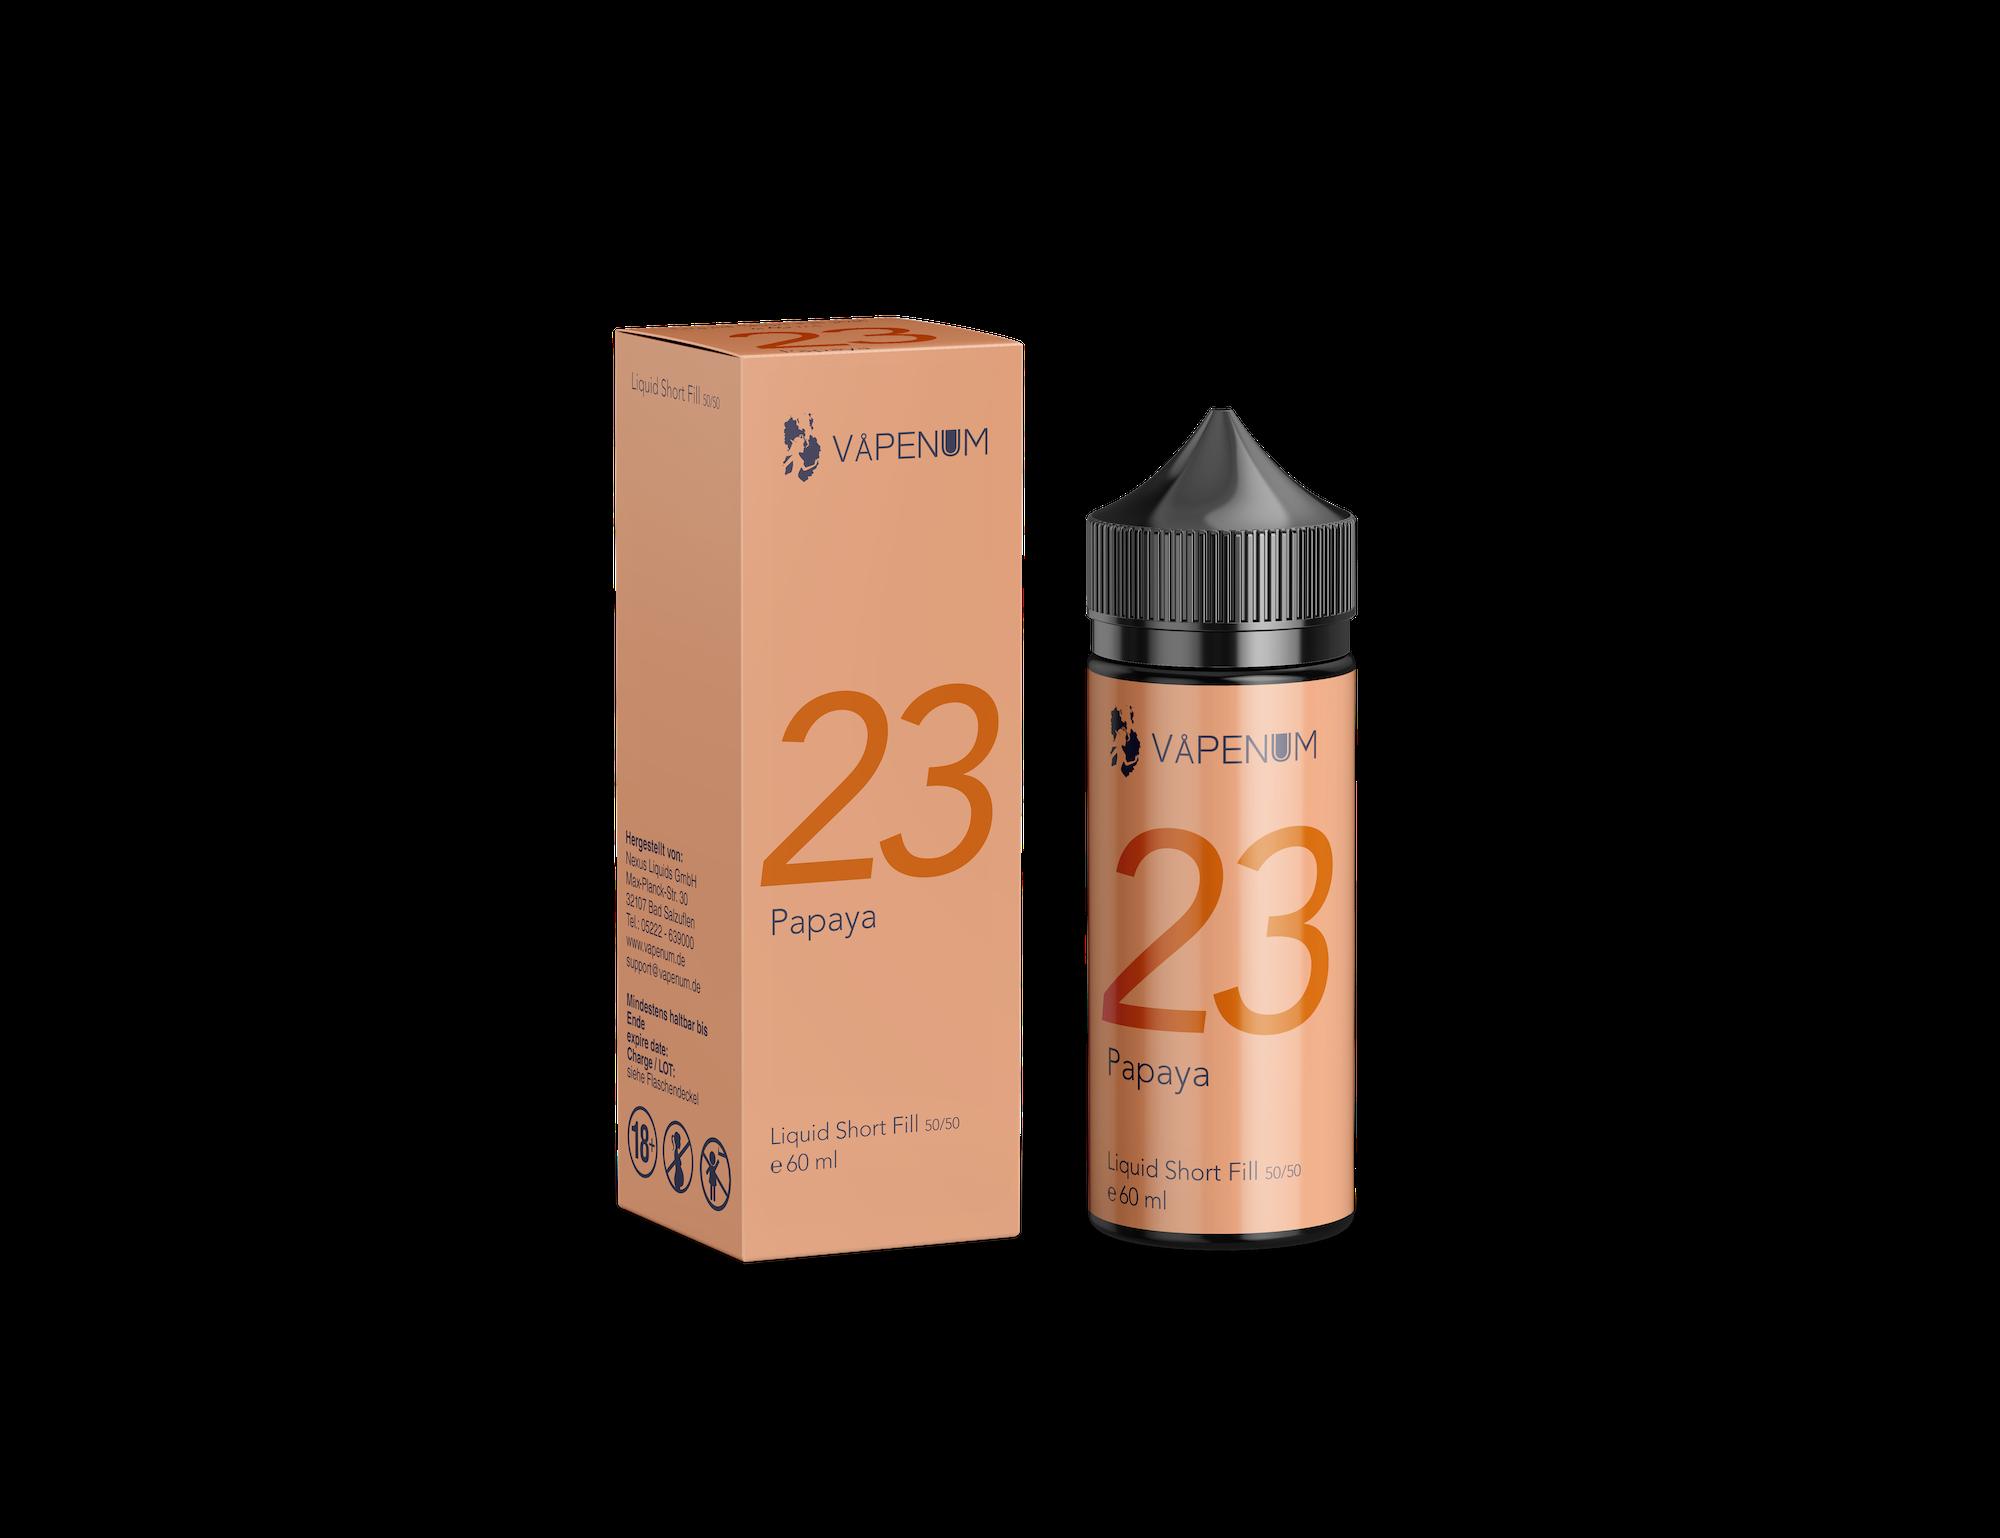 Vapenum Shortfill 23 - Papaya